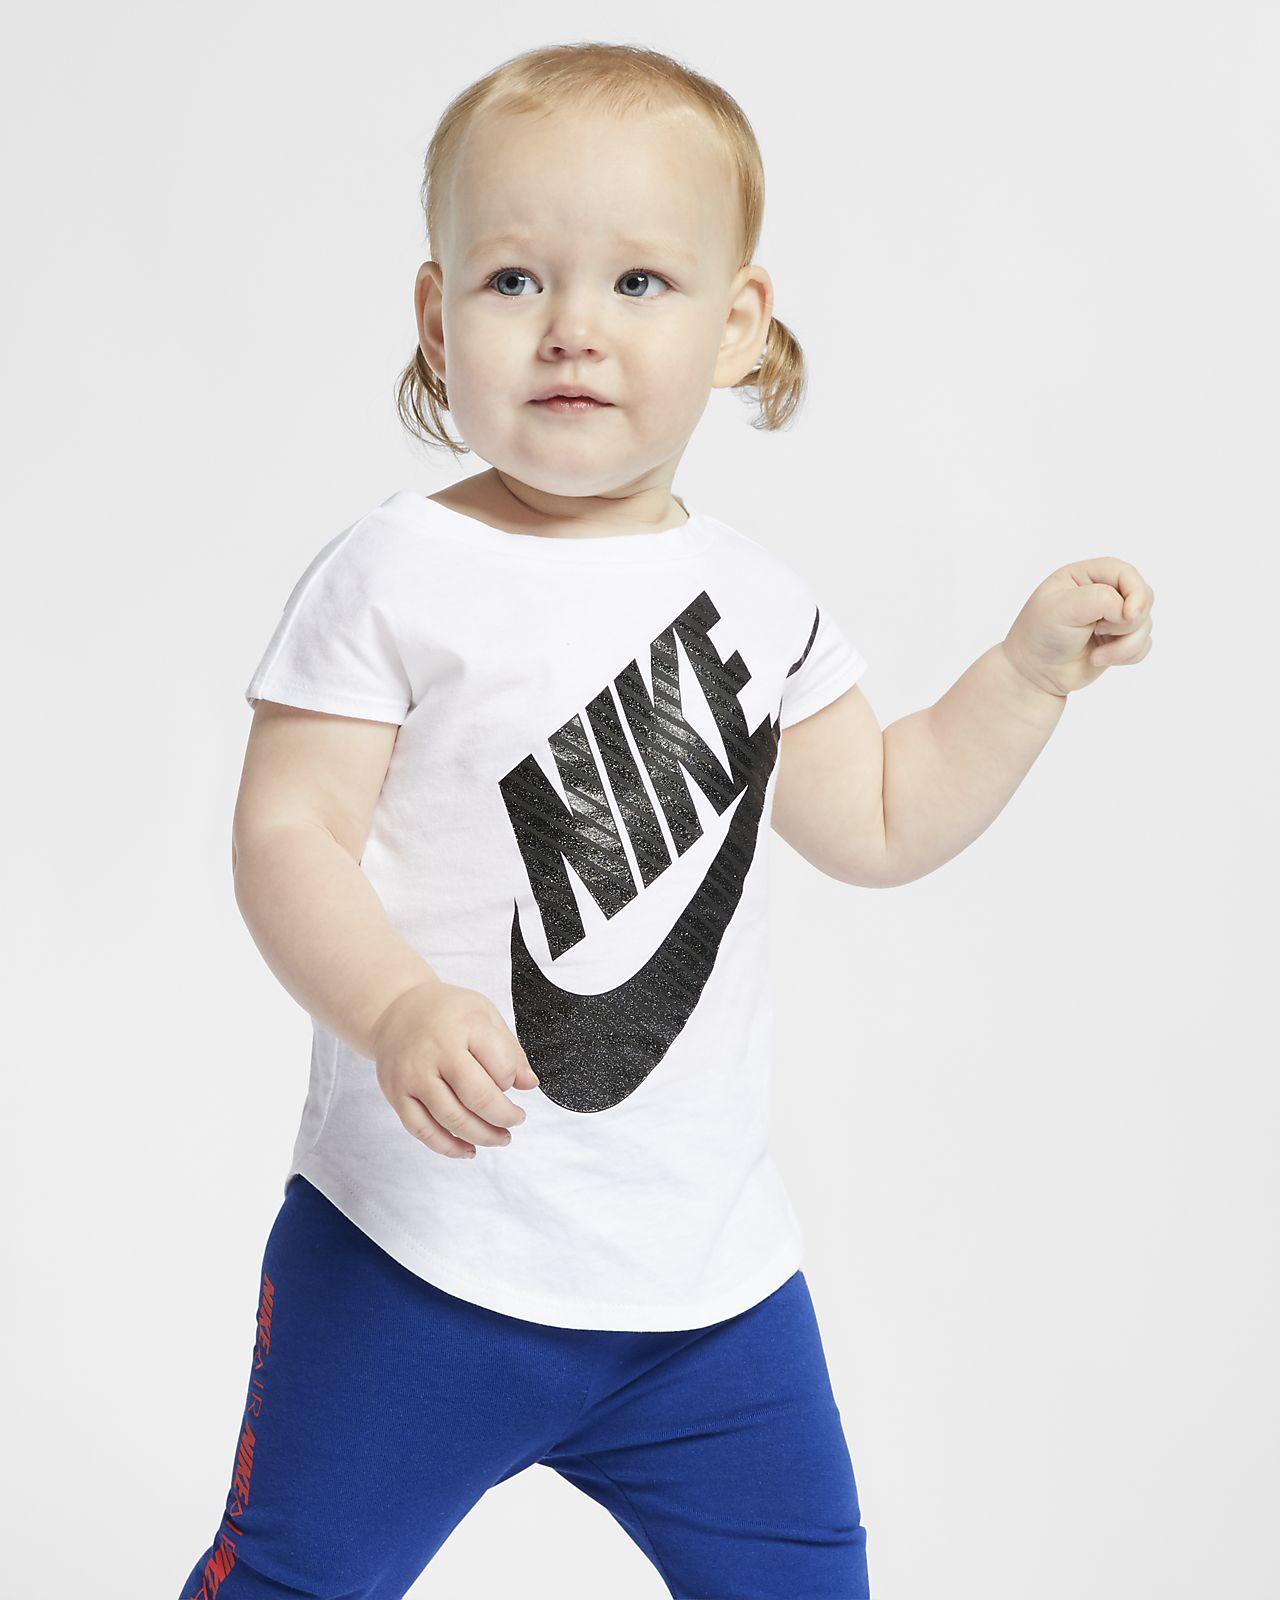 6fb0c0997 Nike Sportswear Camiseta - Bebé (12-24 M). Nike.com ES